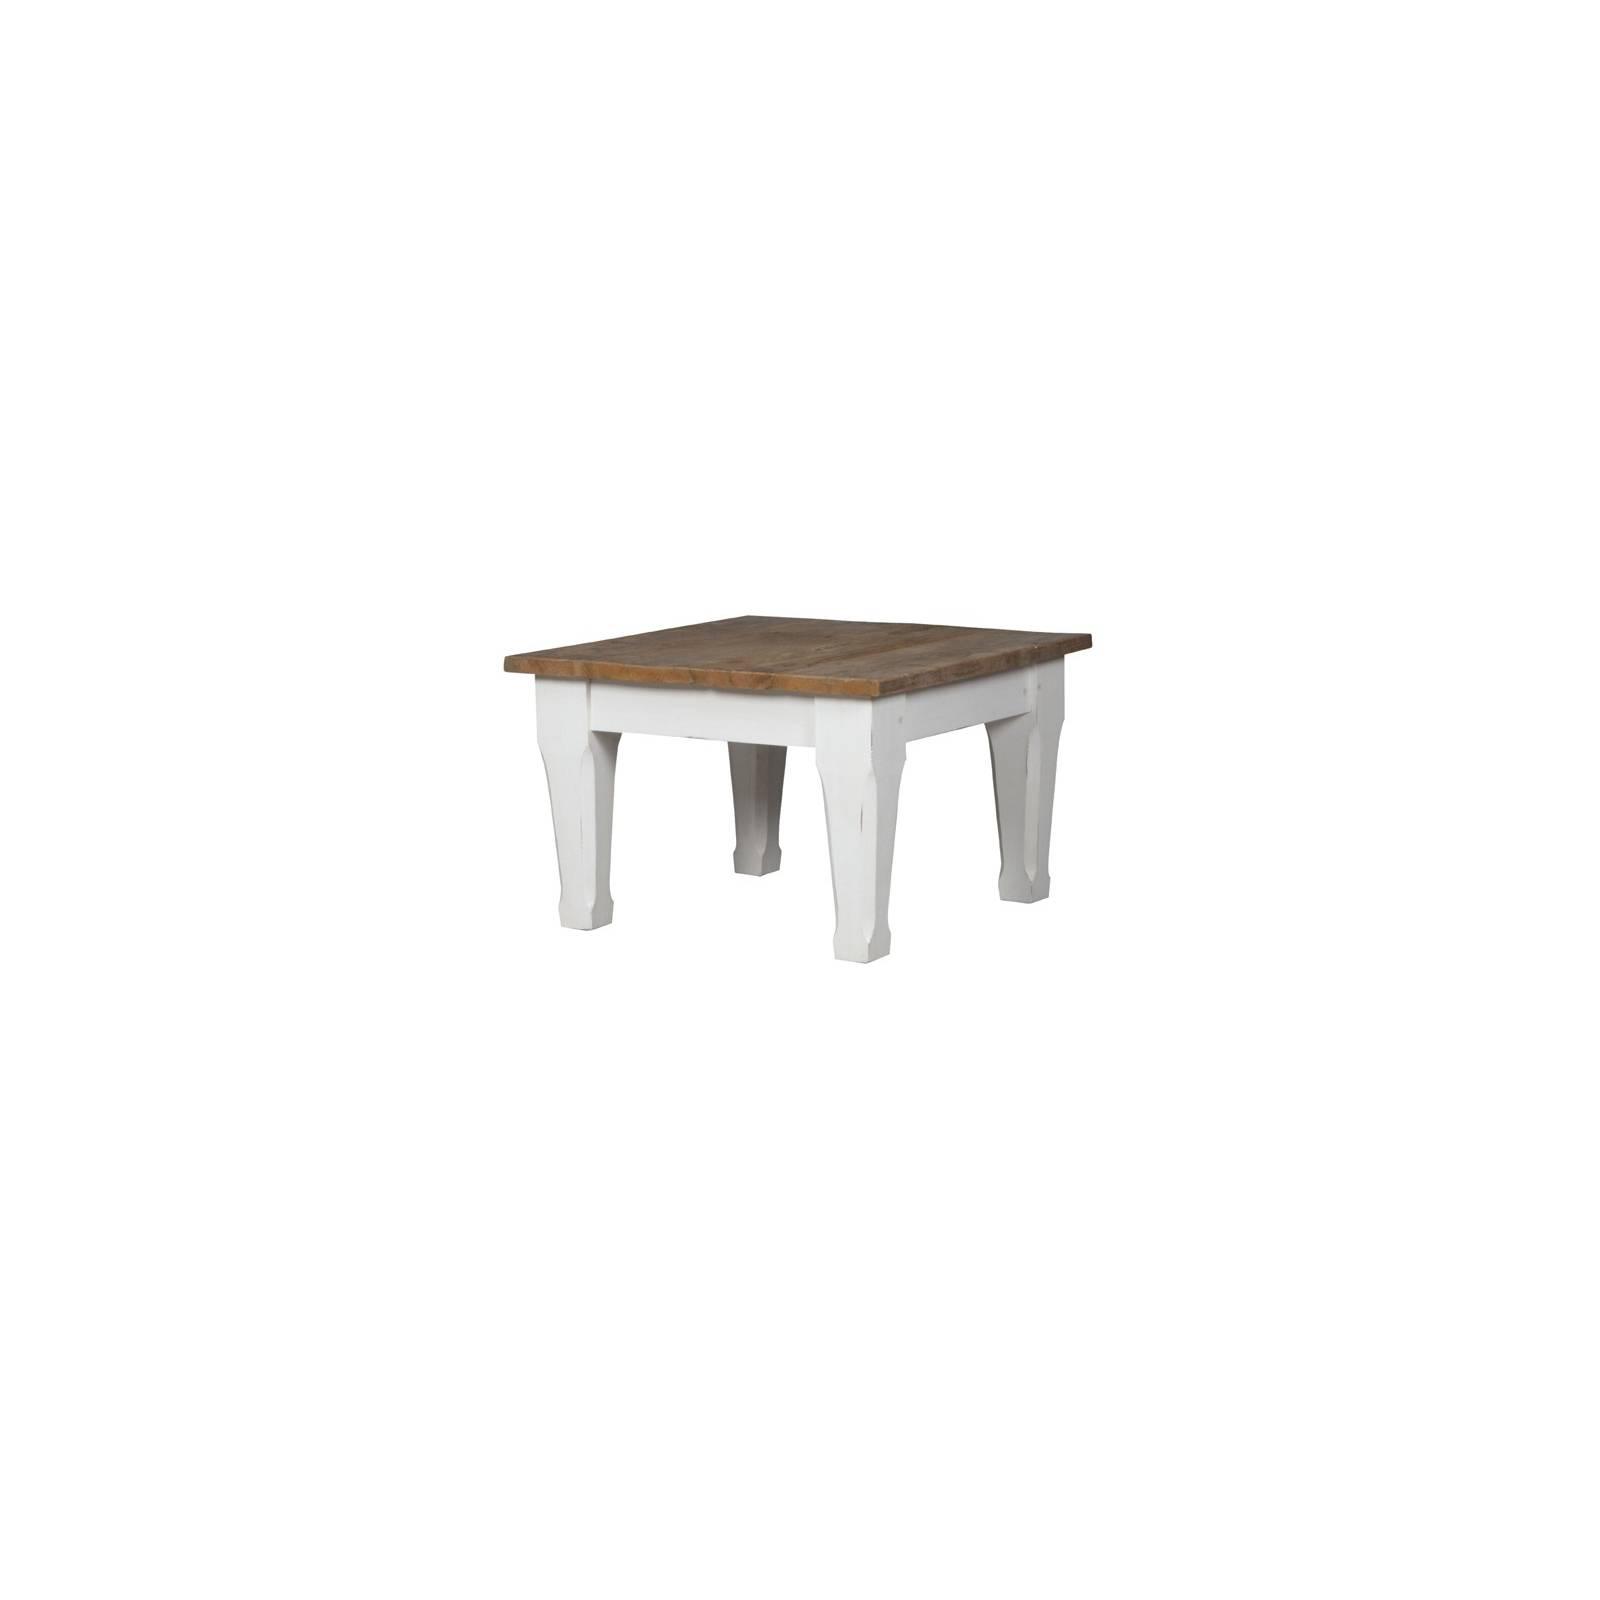 Table Basse Carrée Olimpia Teck - meuble teck massif